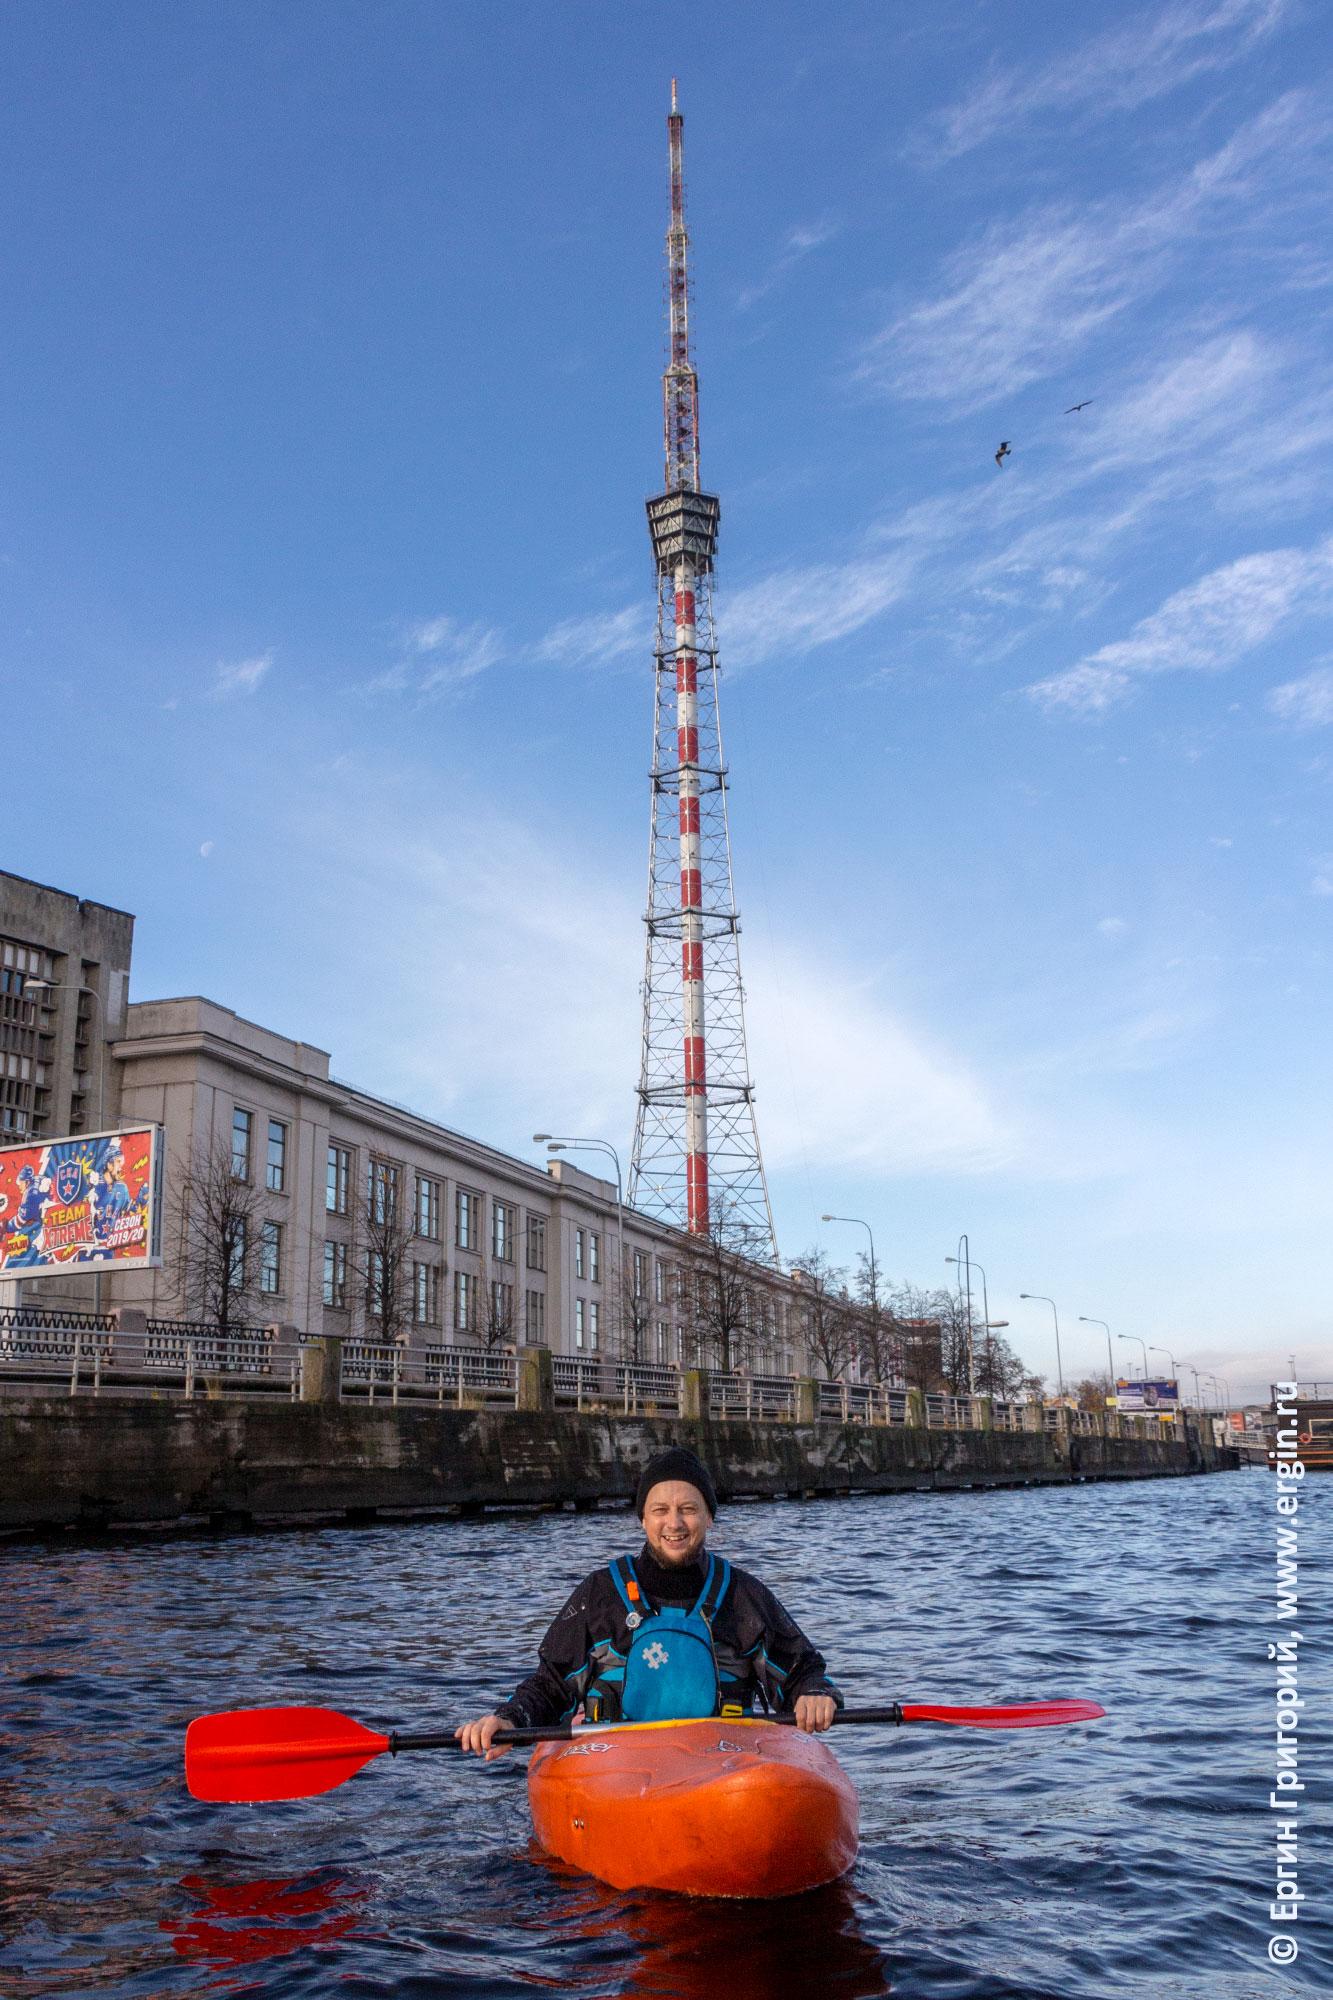 Санкт-Петербургская телебашня и каякер